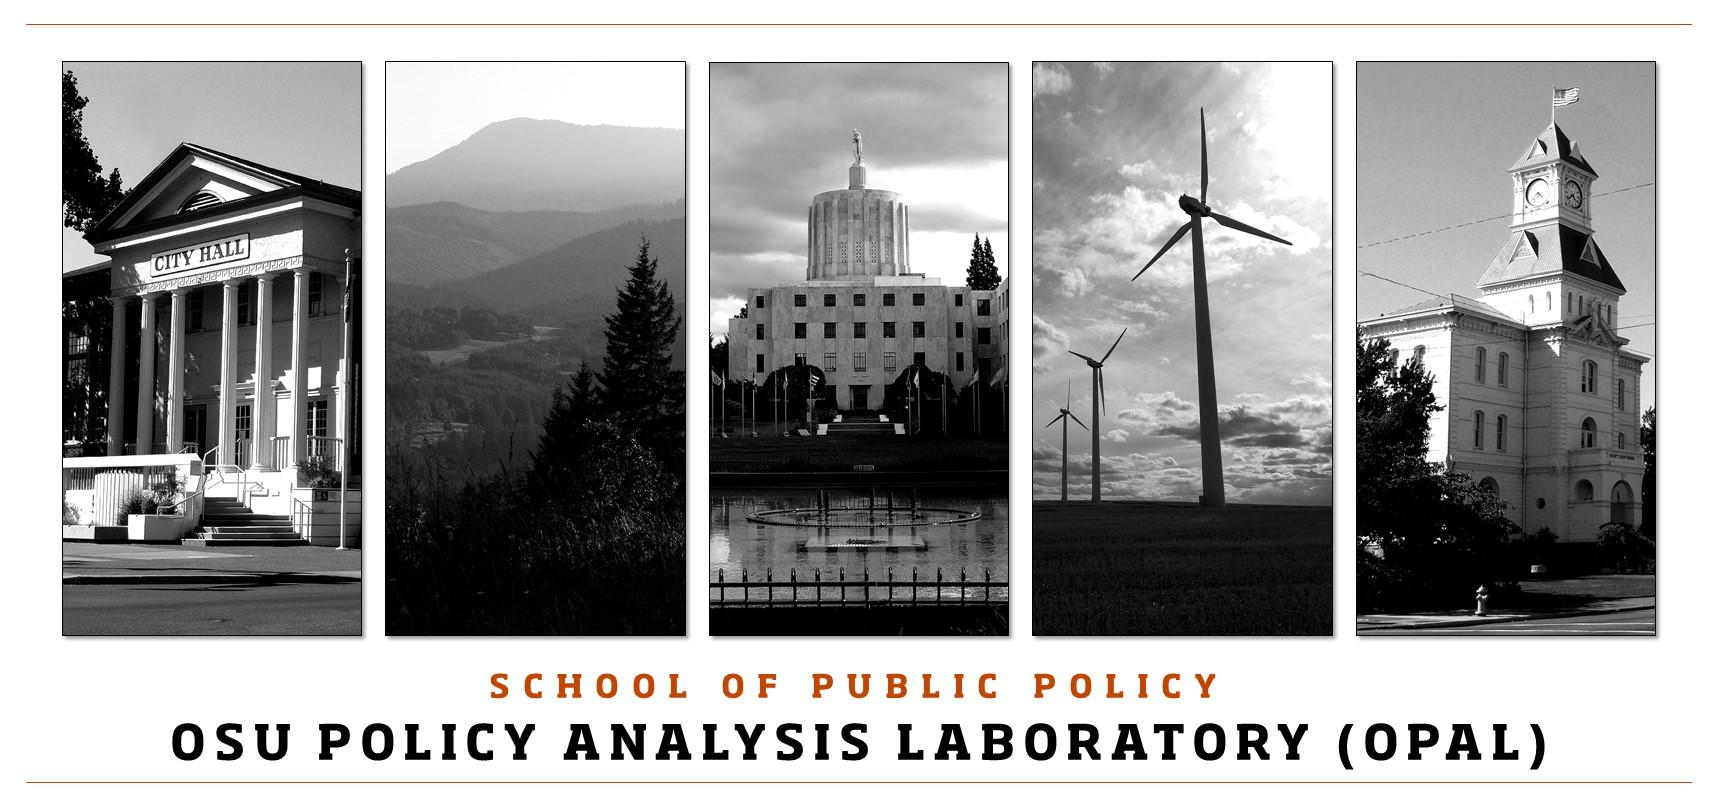 School of Public Policy Oregon Policy Analysis Laboratory